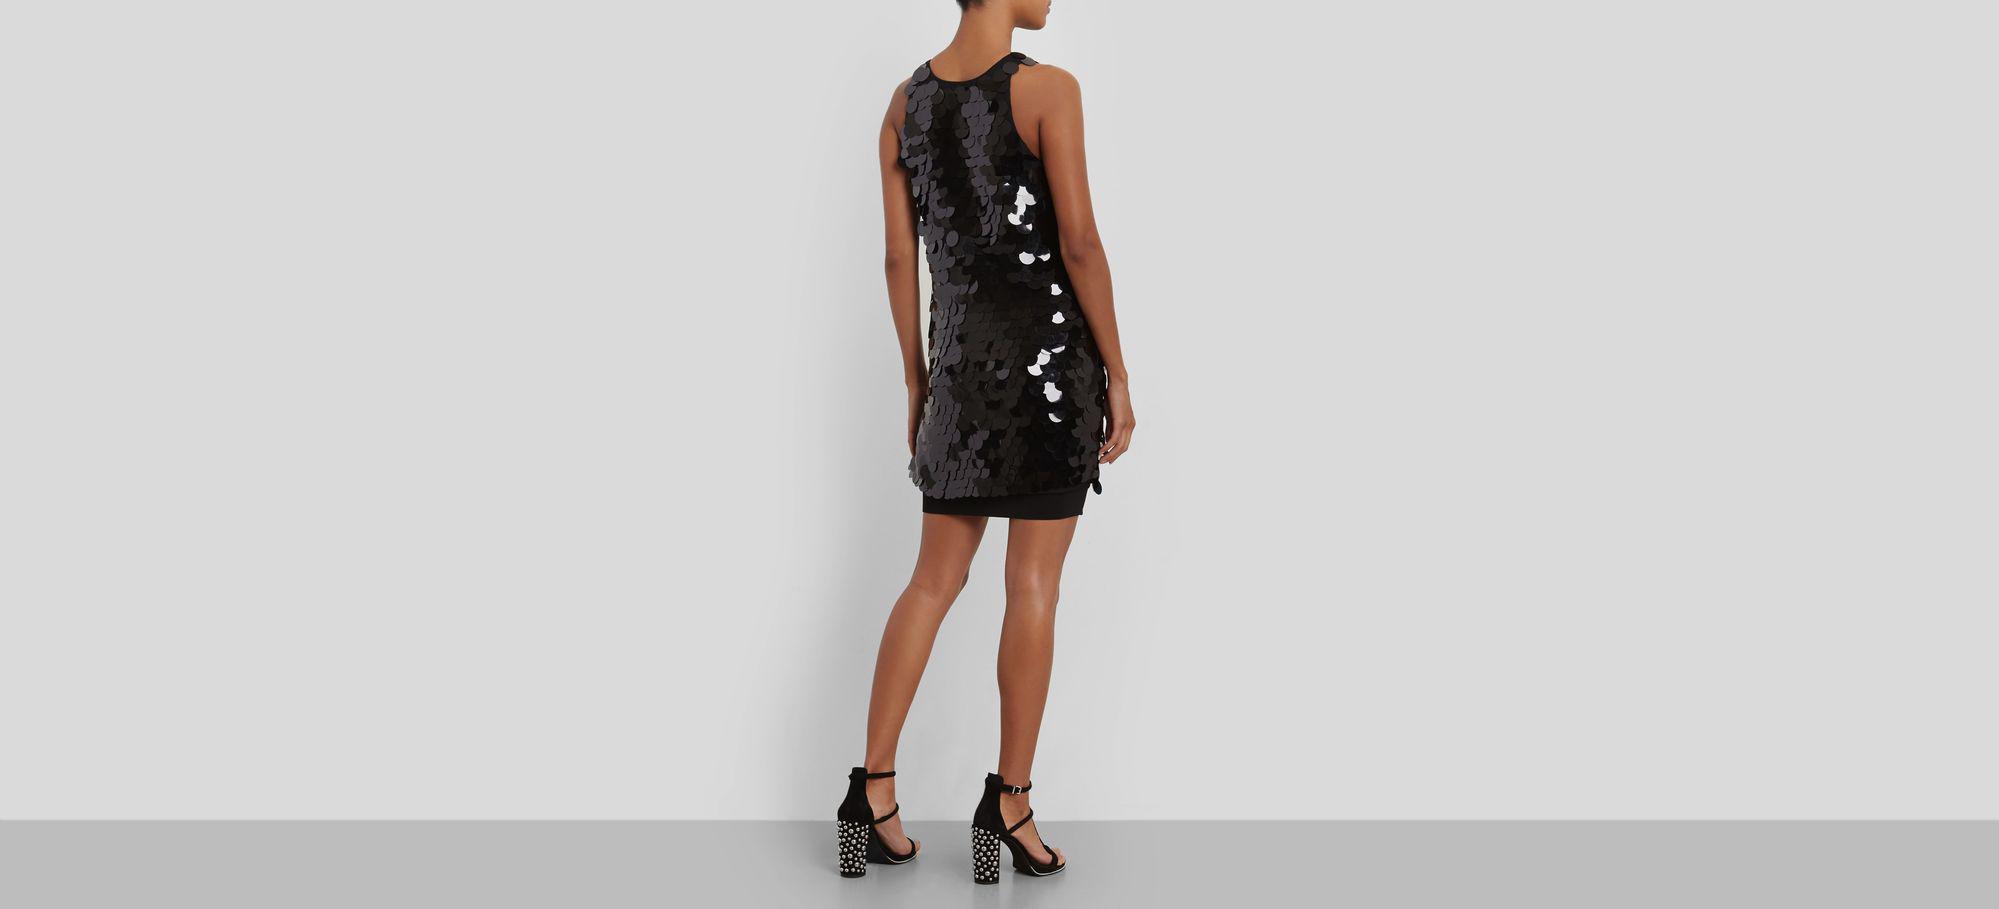 Cheap Sale Ebay Clearance Best Sale Paillete Swing Dress Kenneth Cole Clearance Discounts Top Quality Online 0JaKdvGK